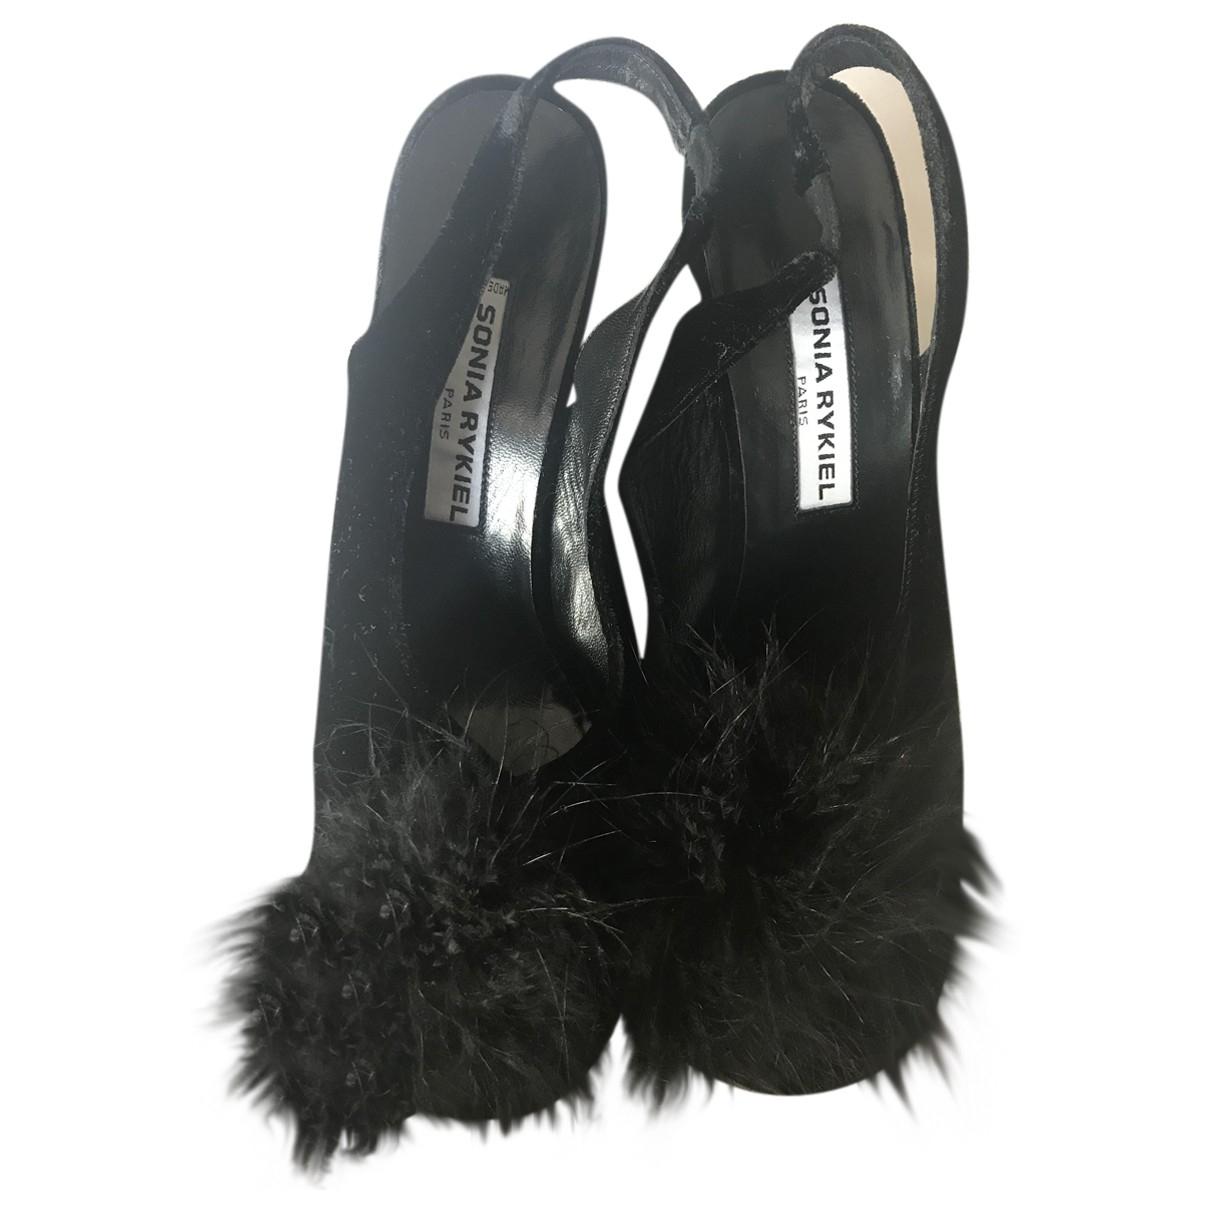 Sonia Rykiel - Sandales   pour femme en velours - noir